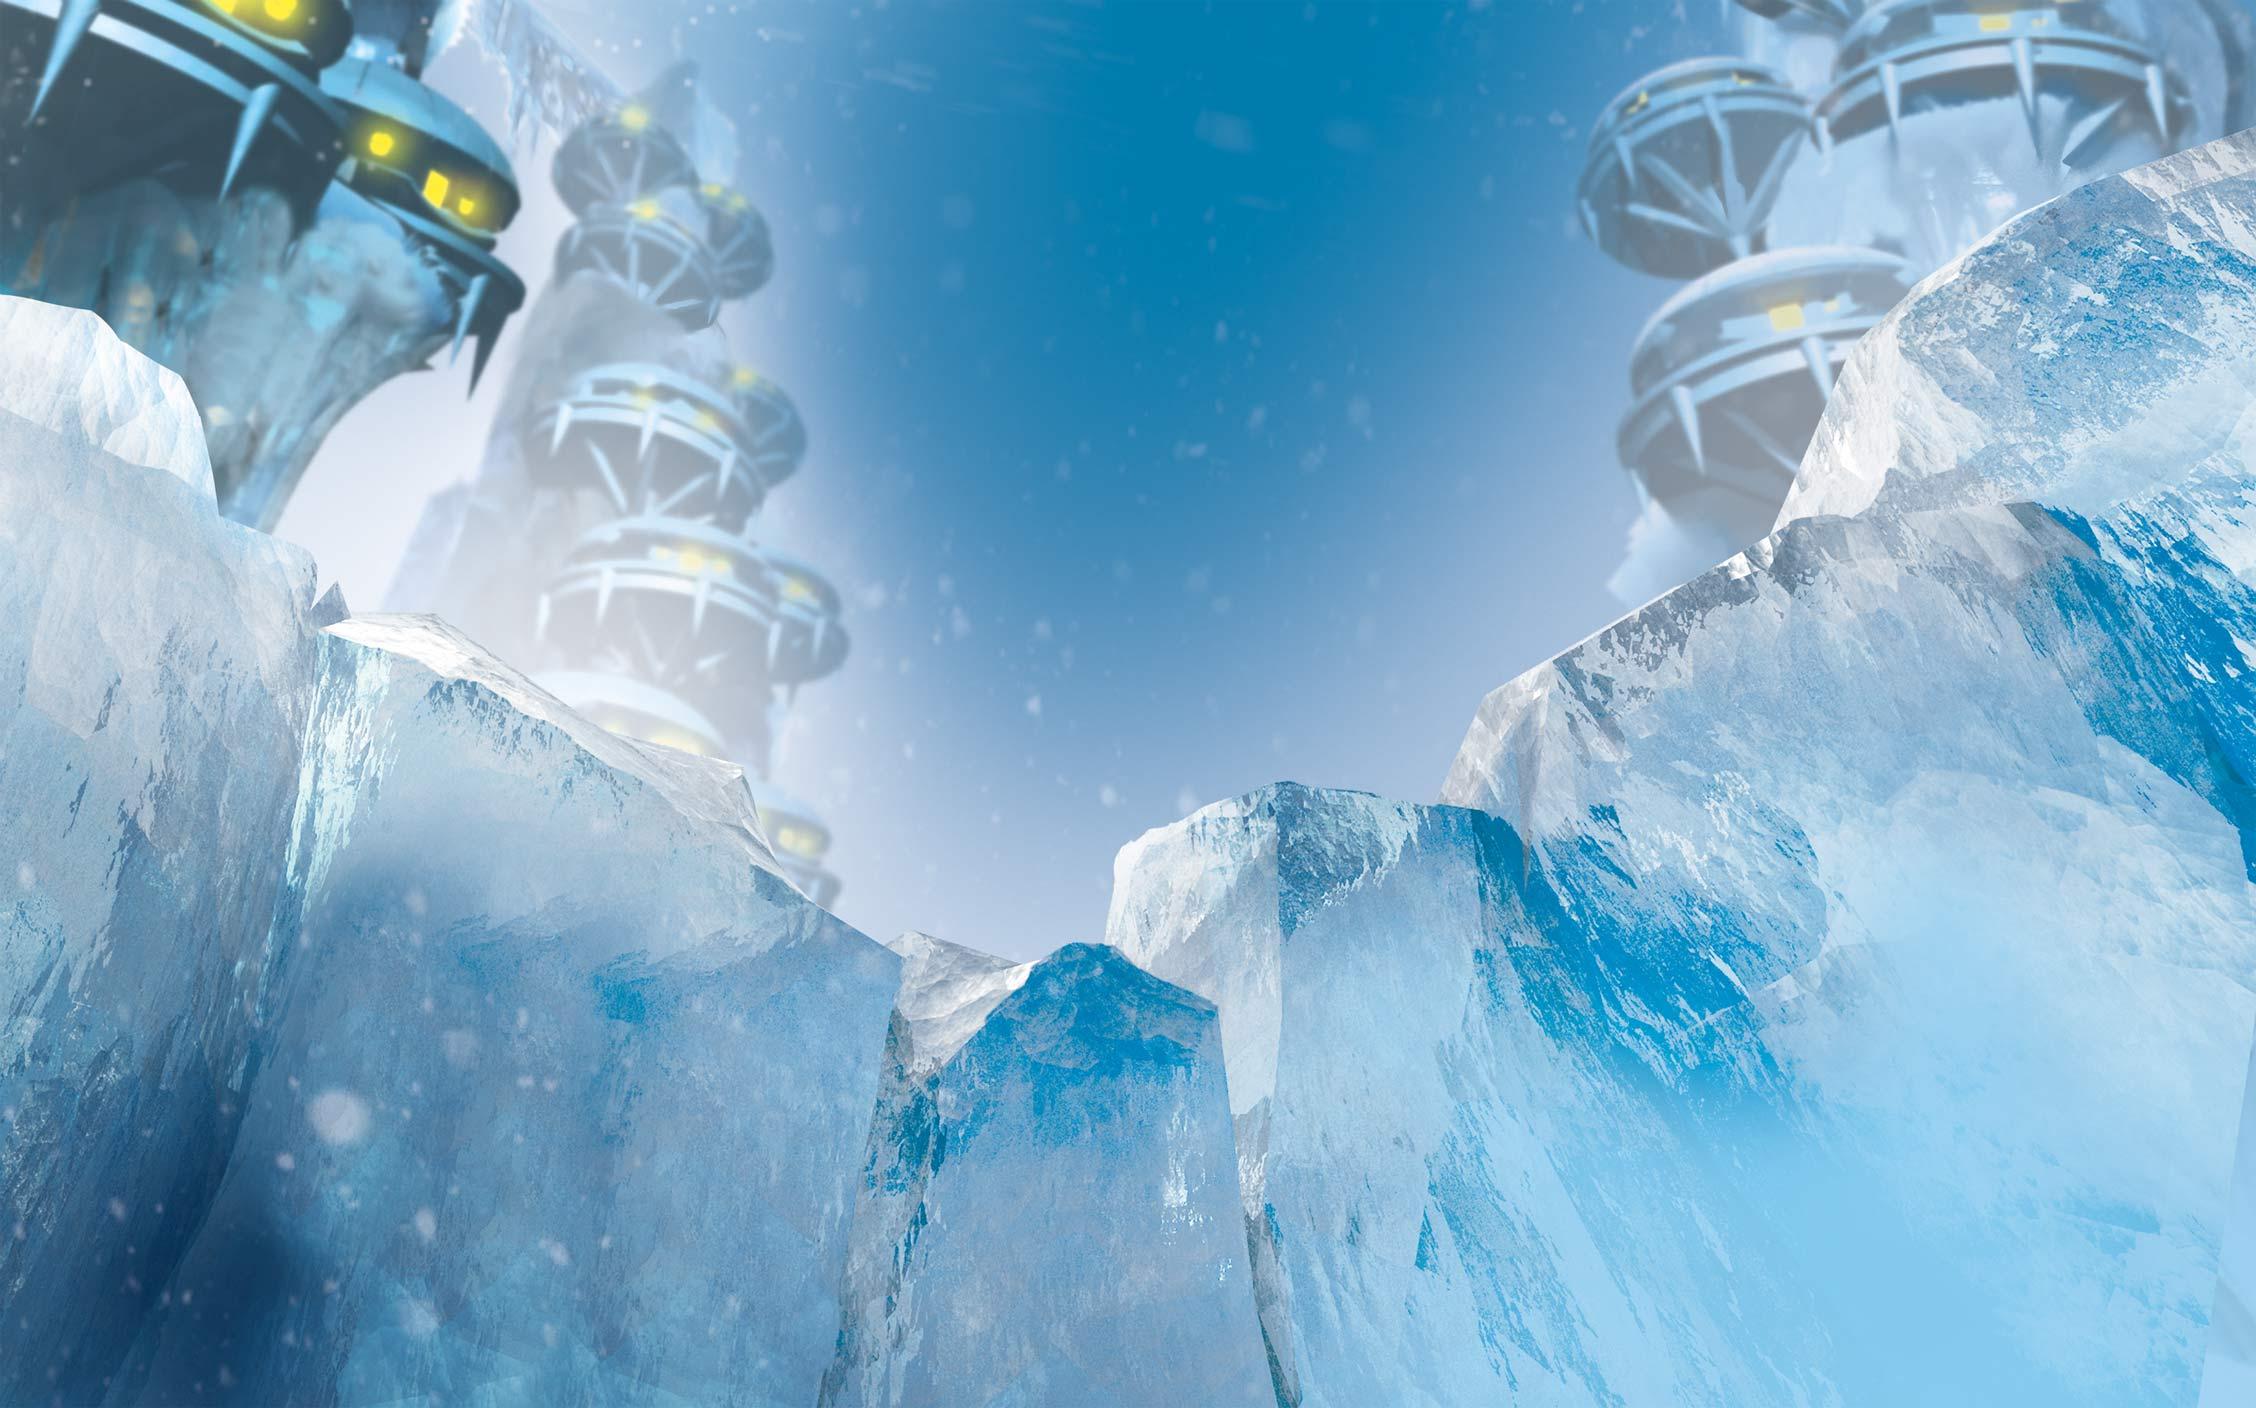 Region of Ice